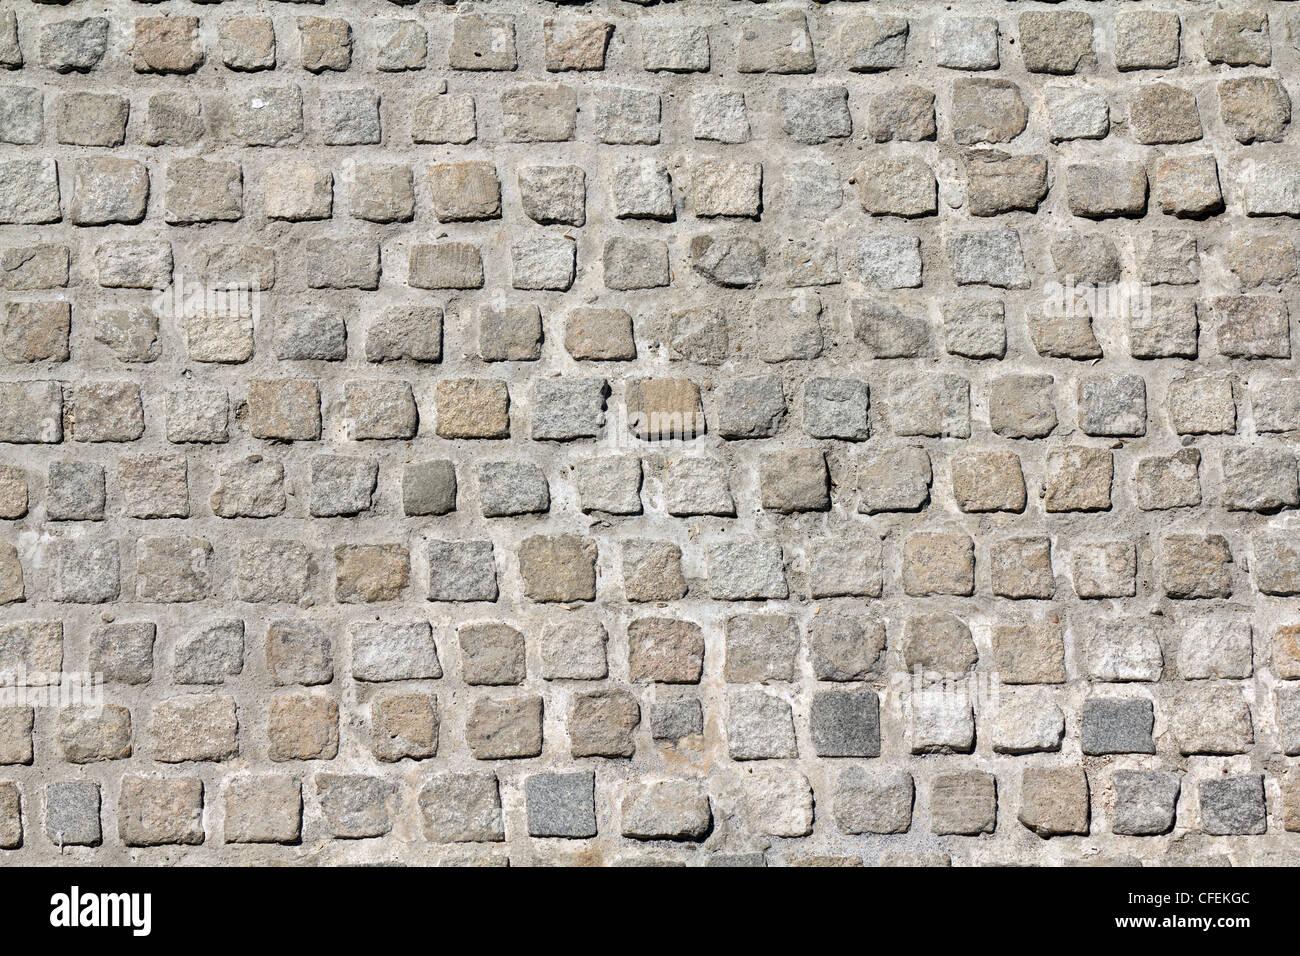 Cobblestone road background pattern - Stock Image